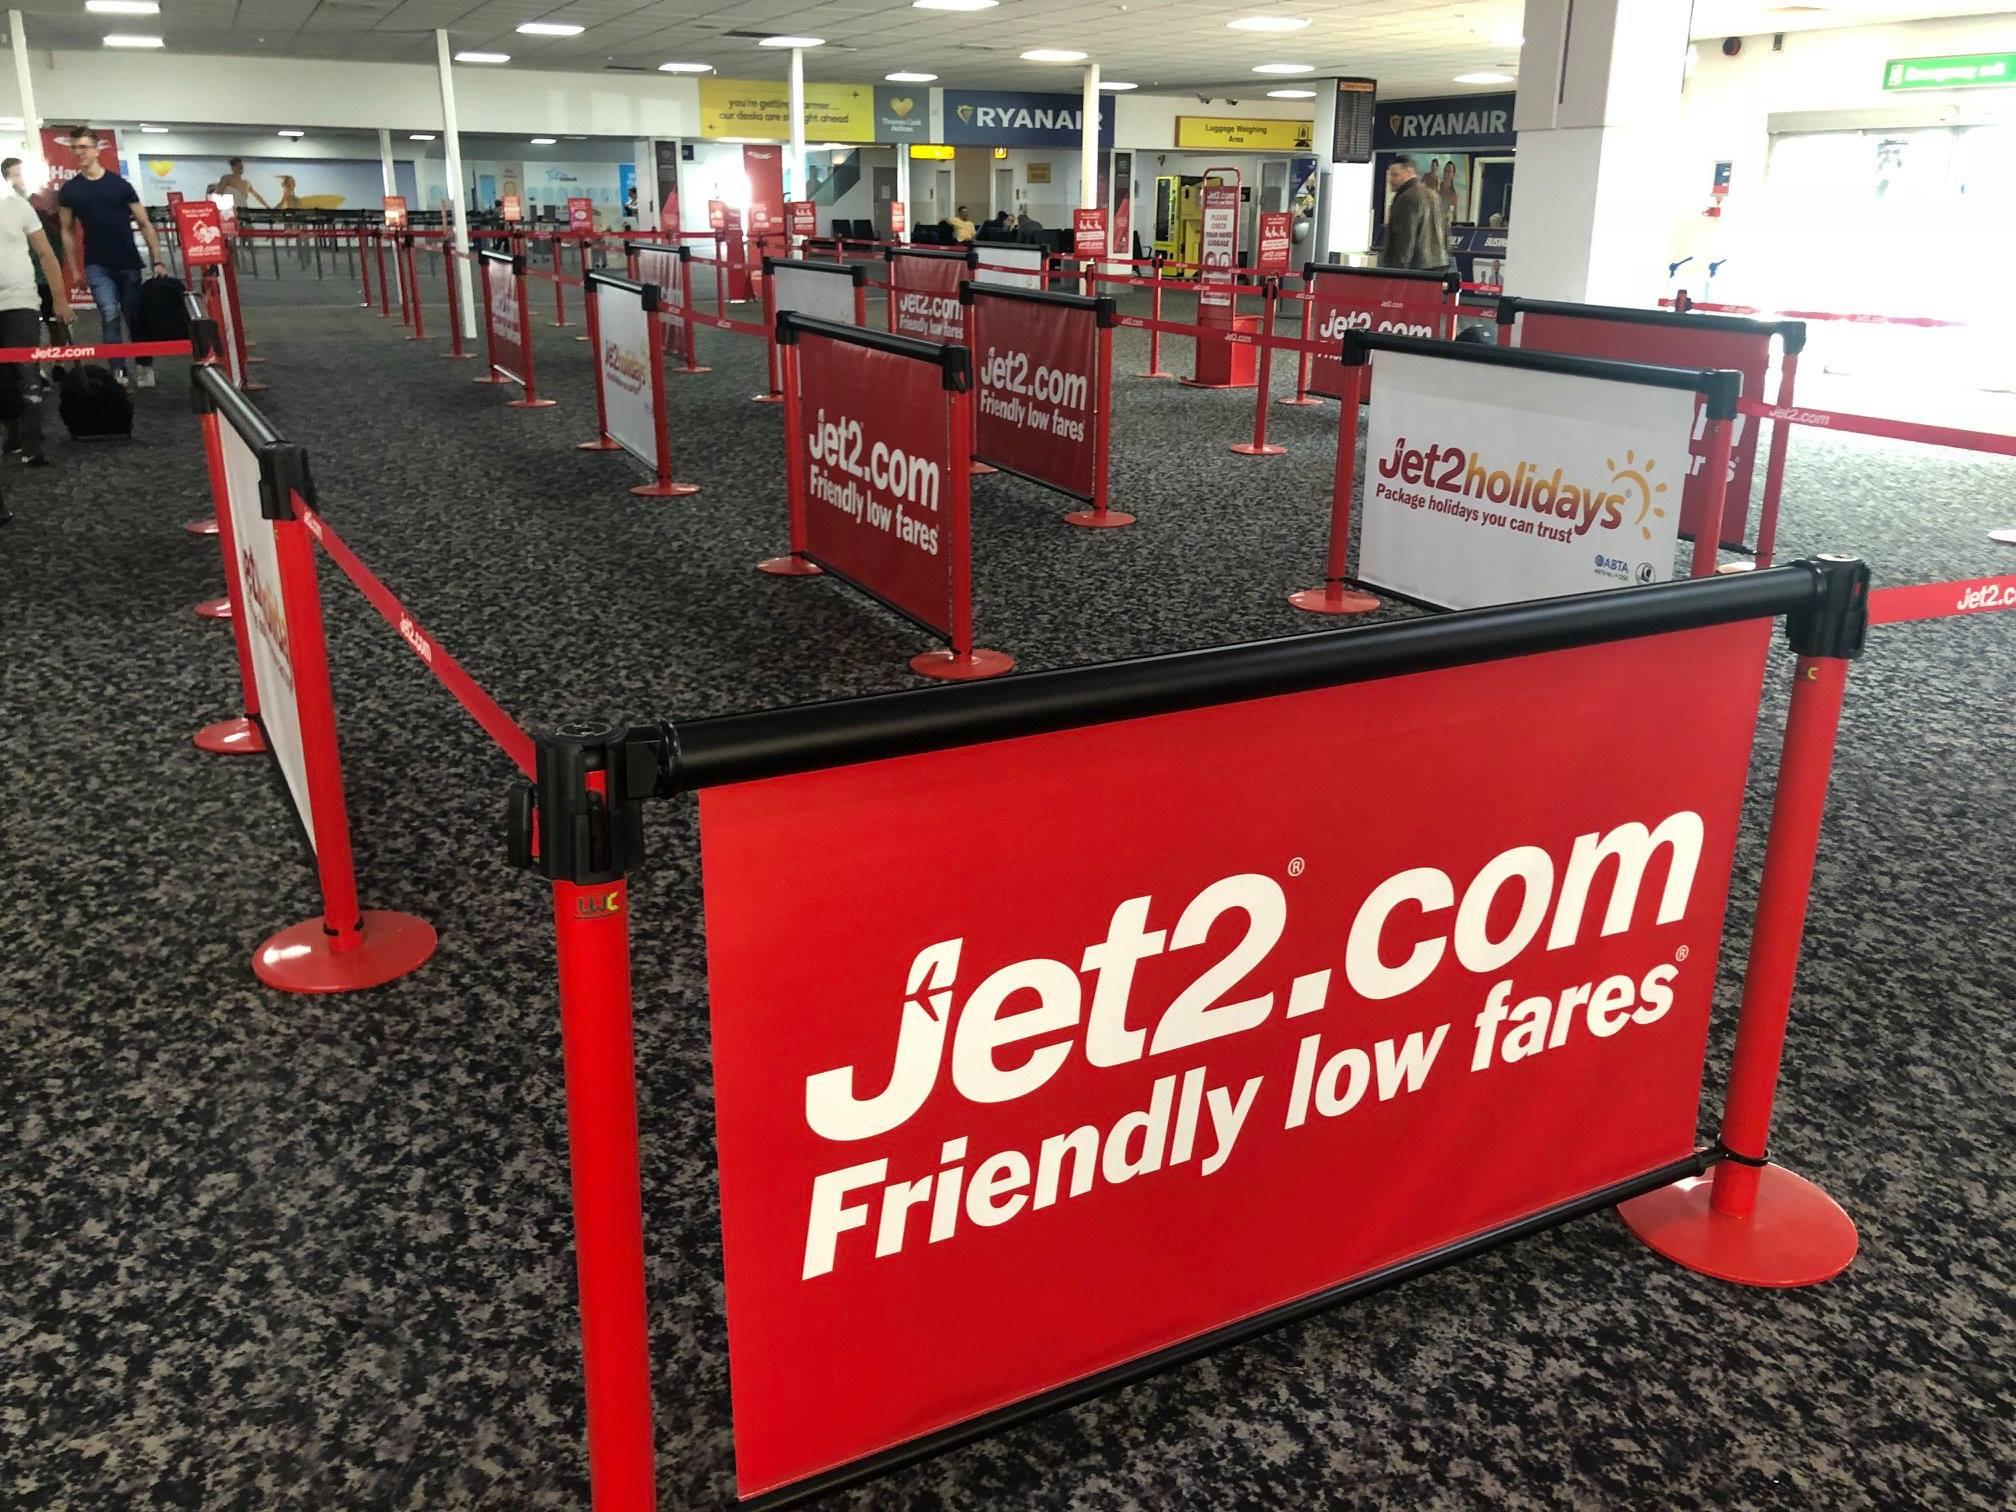 23 Jet2